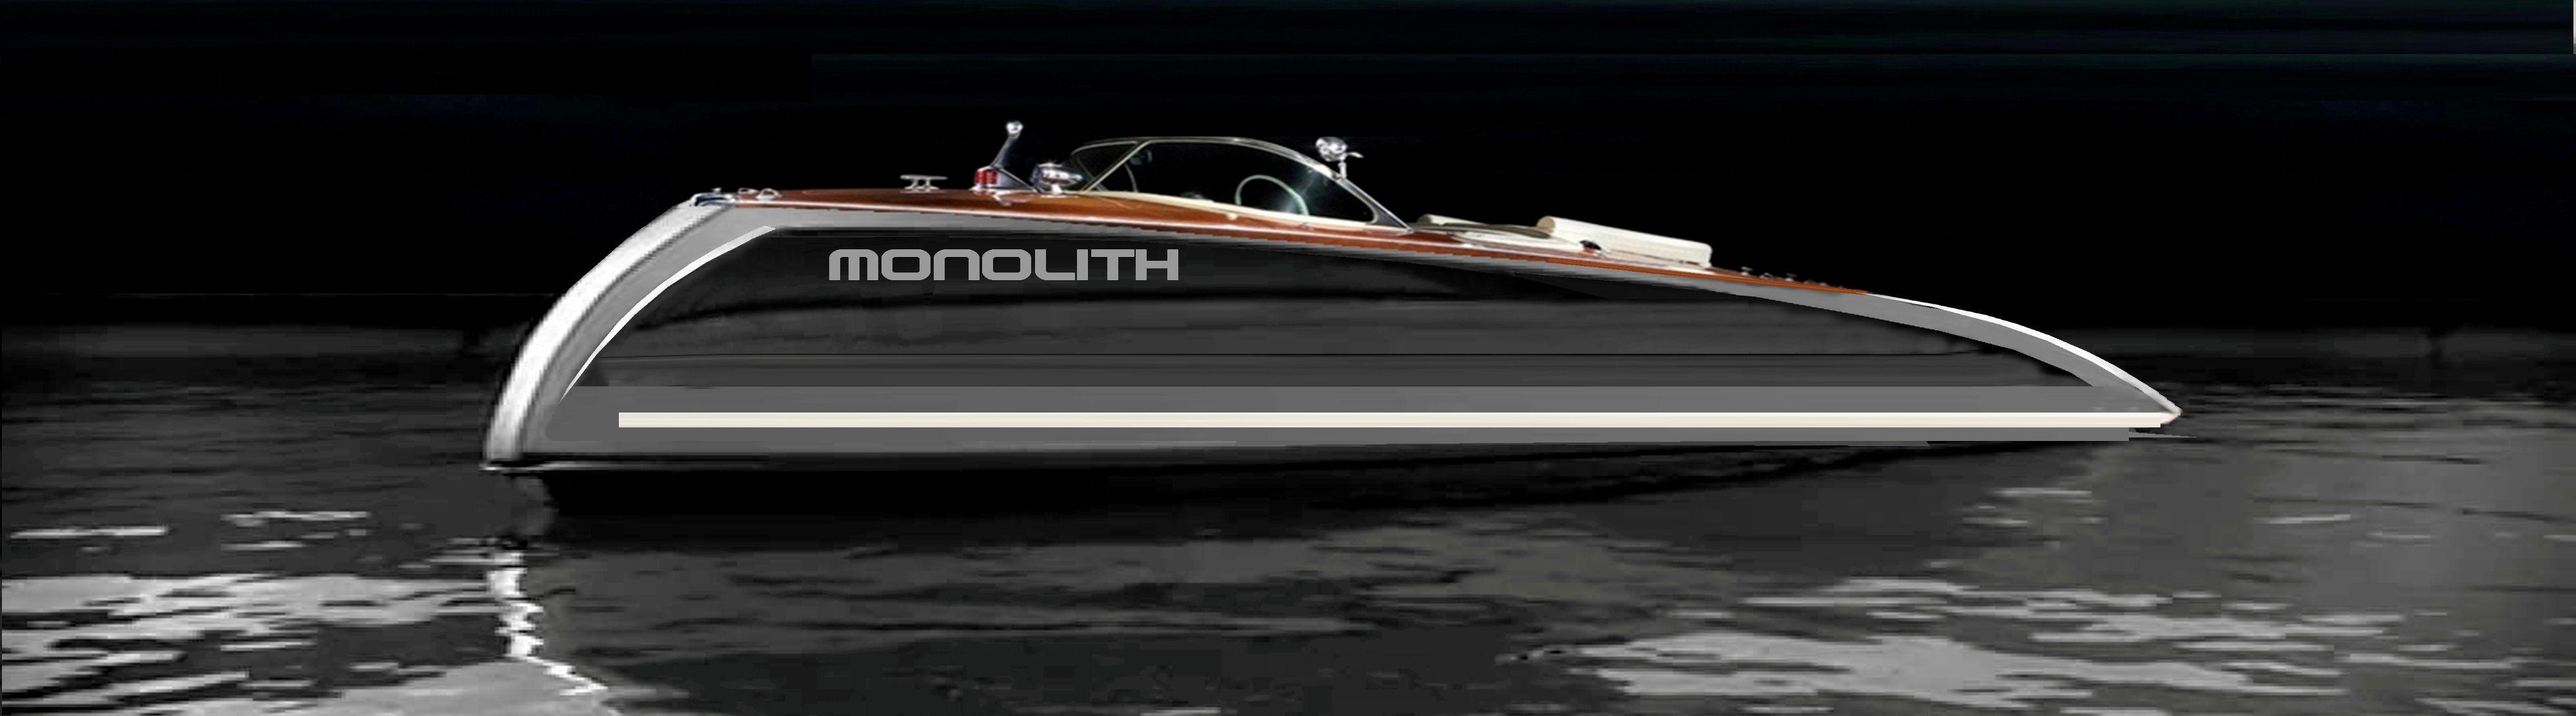 Speed Boat Boat Design Motor Boat Design Motor Boat